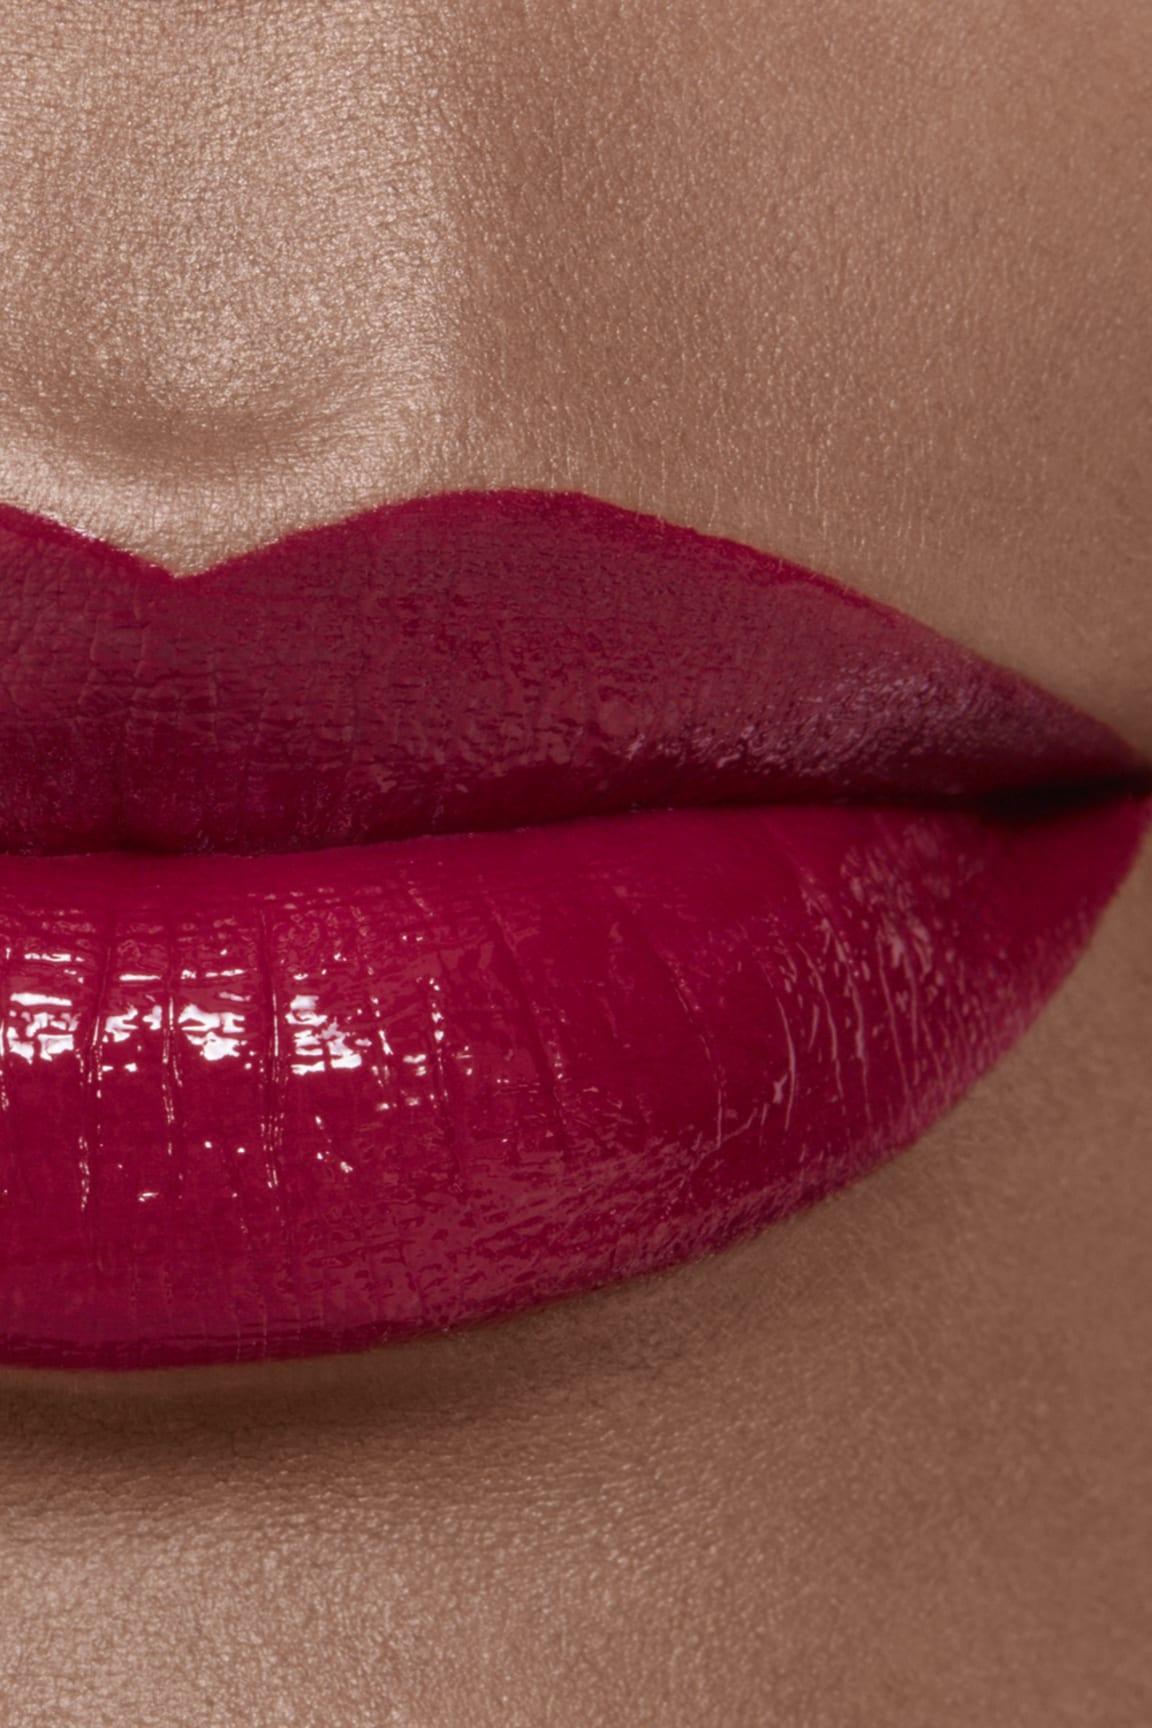 Imagen aplicación de maquillaje 2 - ROUGE ALLURE LAQUE 80 - TIMELESS